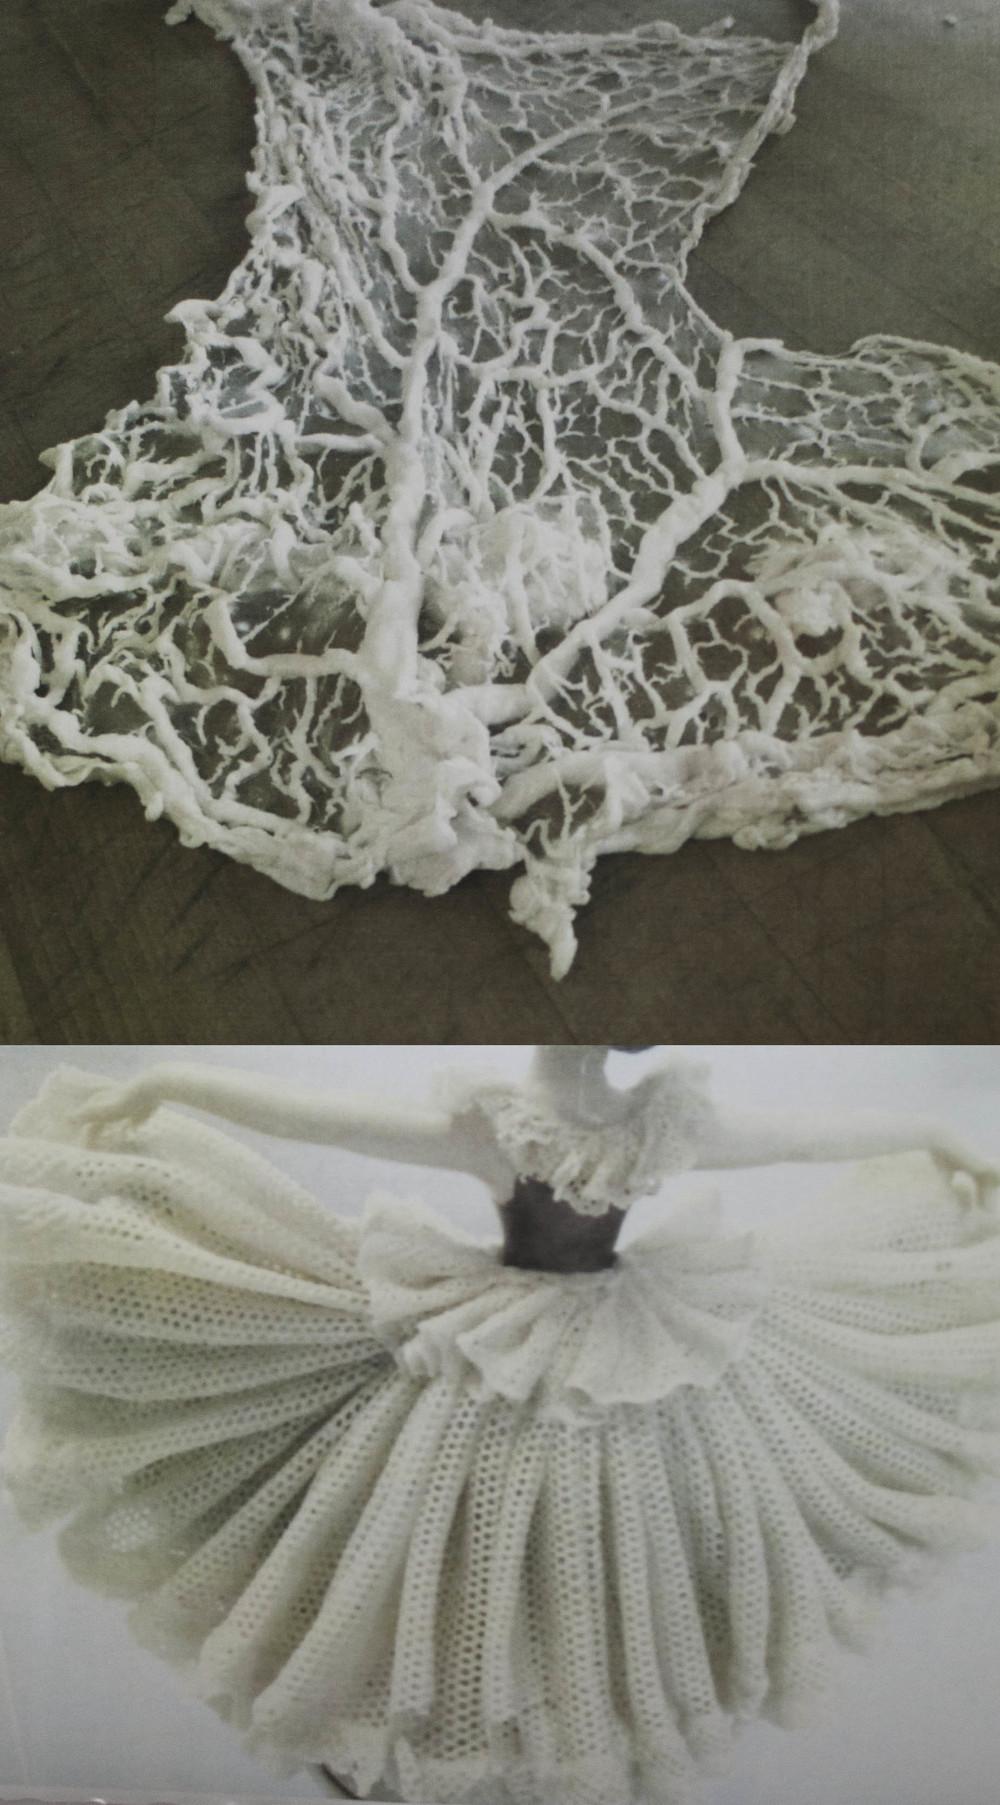 Investigando la técnica de porcelana Dresden, queriendo hacer  de tripas porcelana .